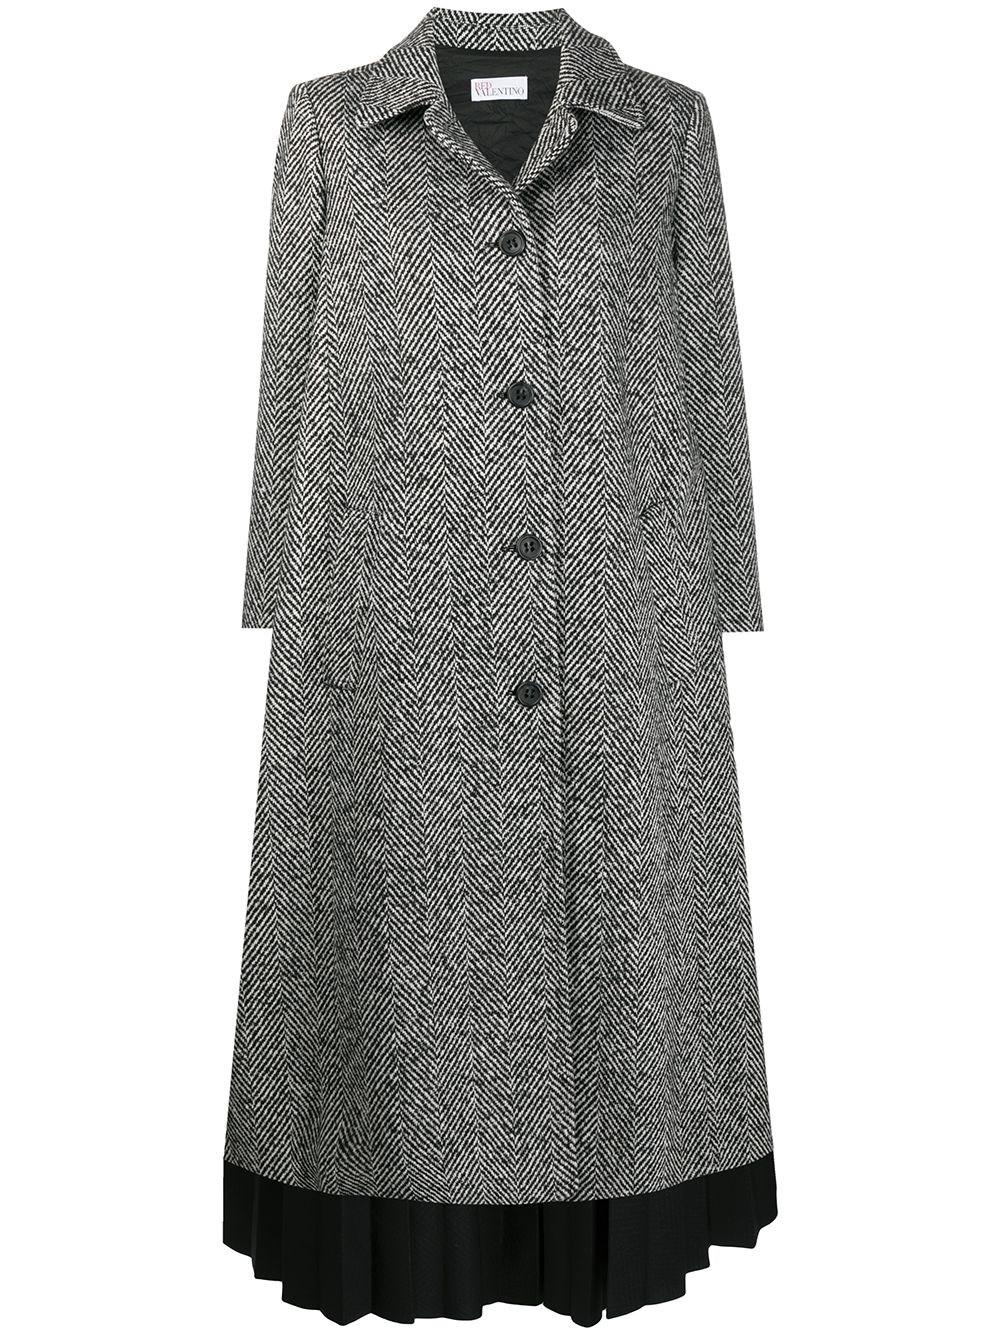 REDVALENTINO Coat In Macro Chevron